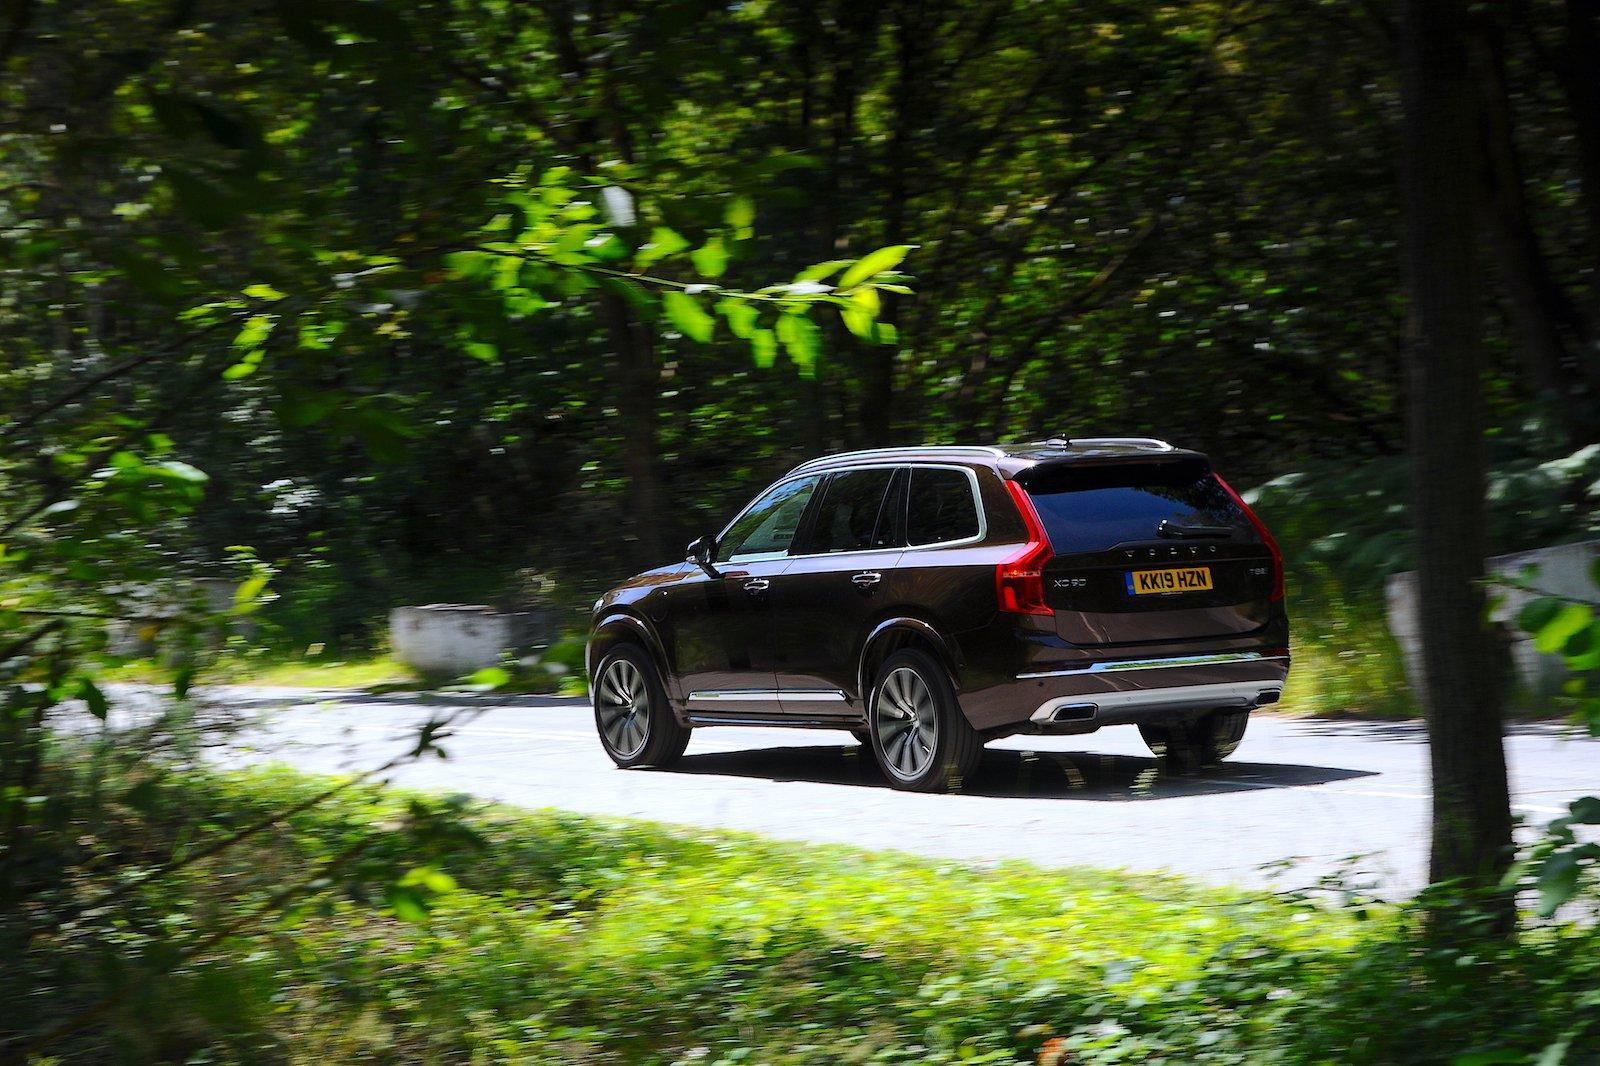 2019 Volvo XC90 long-term rear